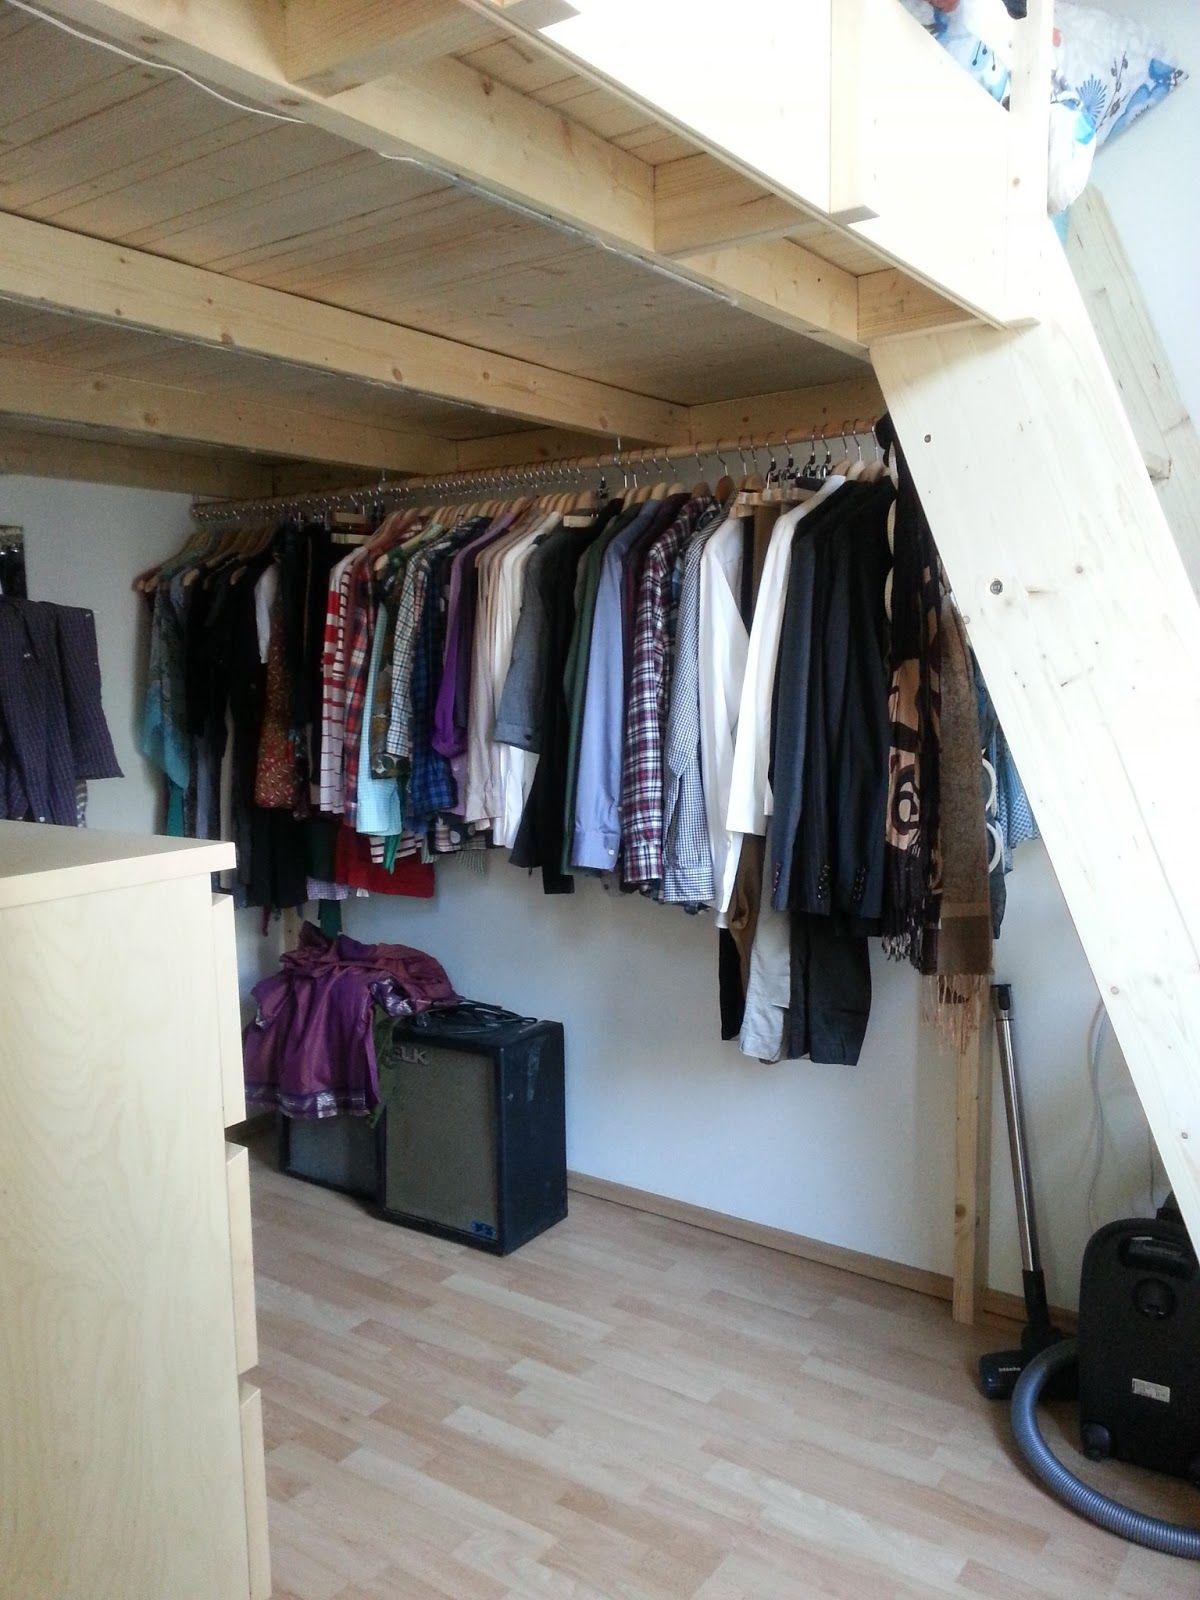 Wiener Schnitzel Und Lederhosen Loft Closet Loft Bed Bunk Bed